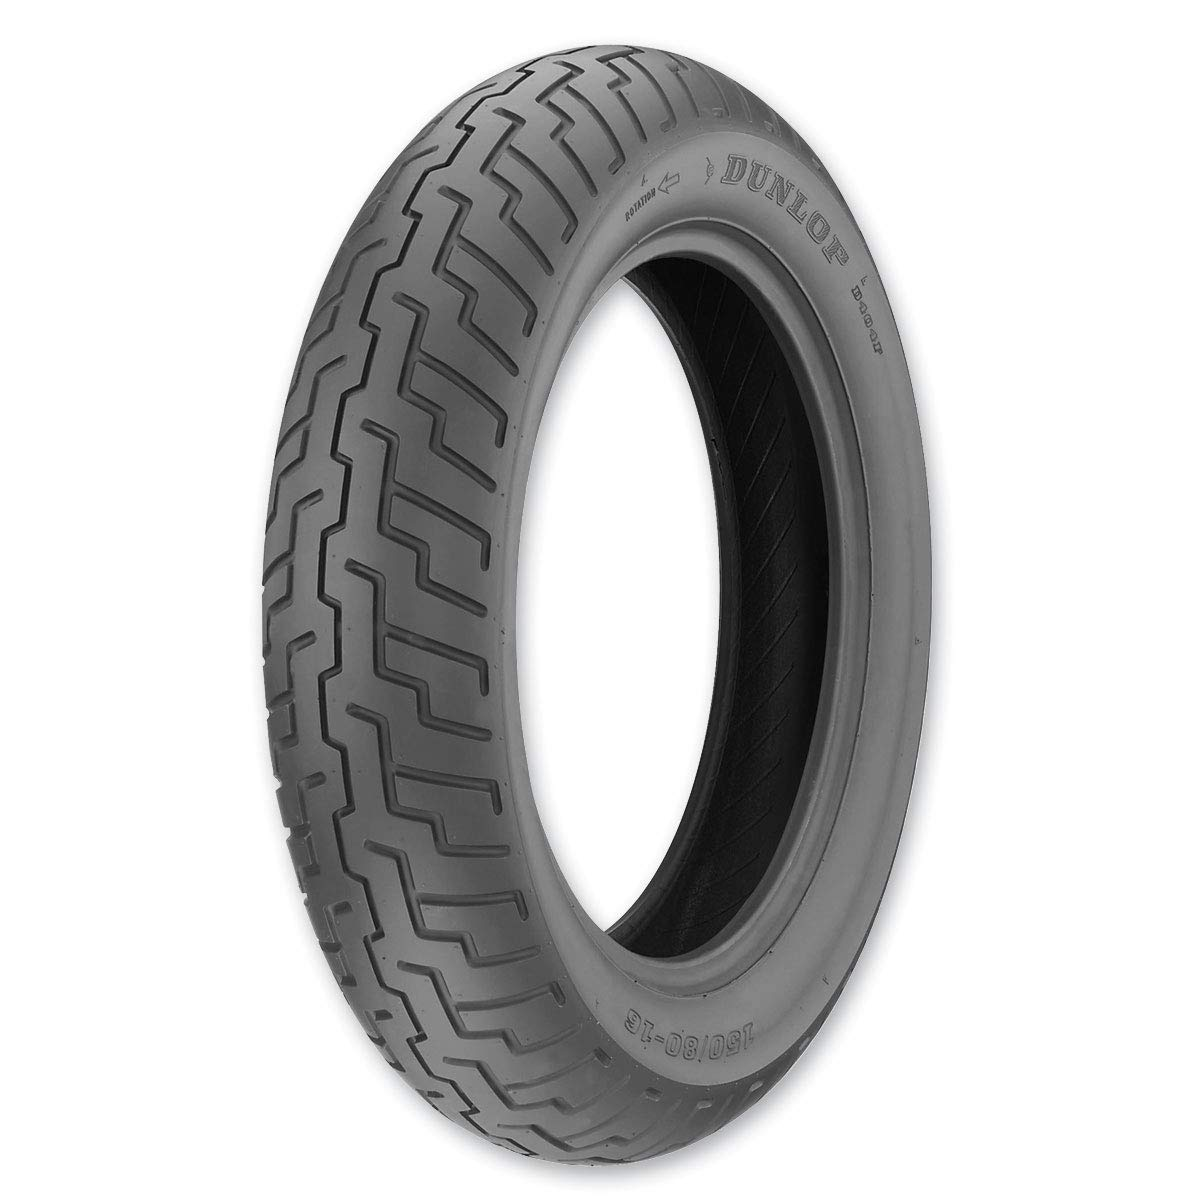 Dunlop D404 Front Tire (120/90-17) 4333415954